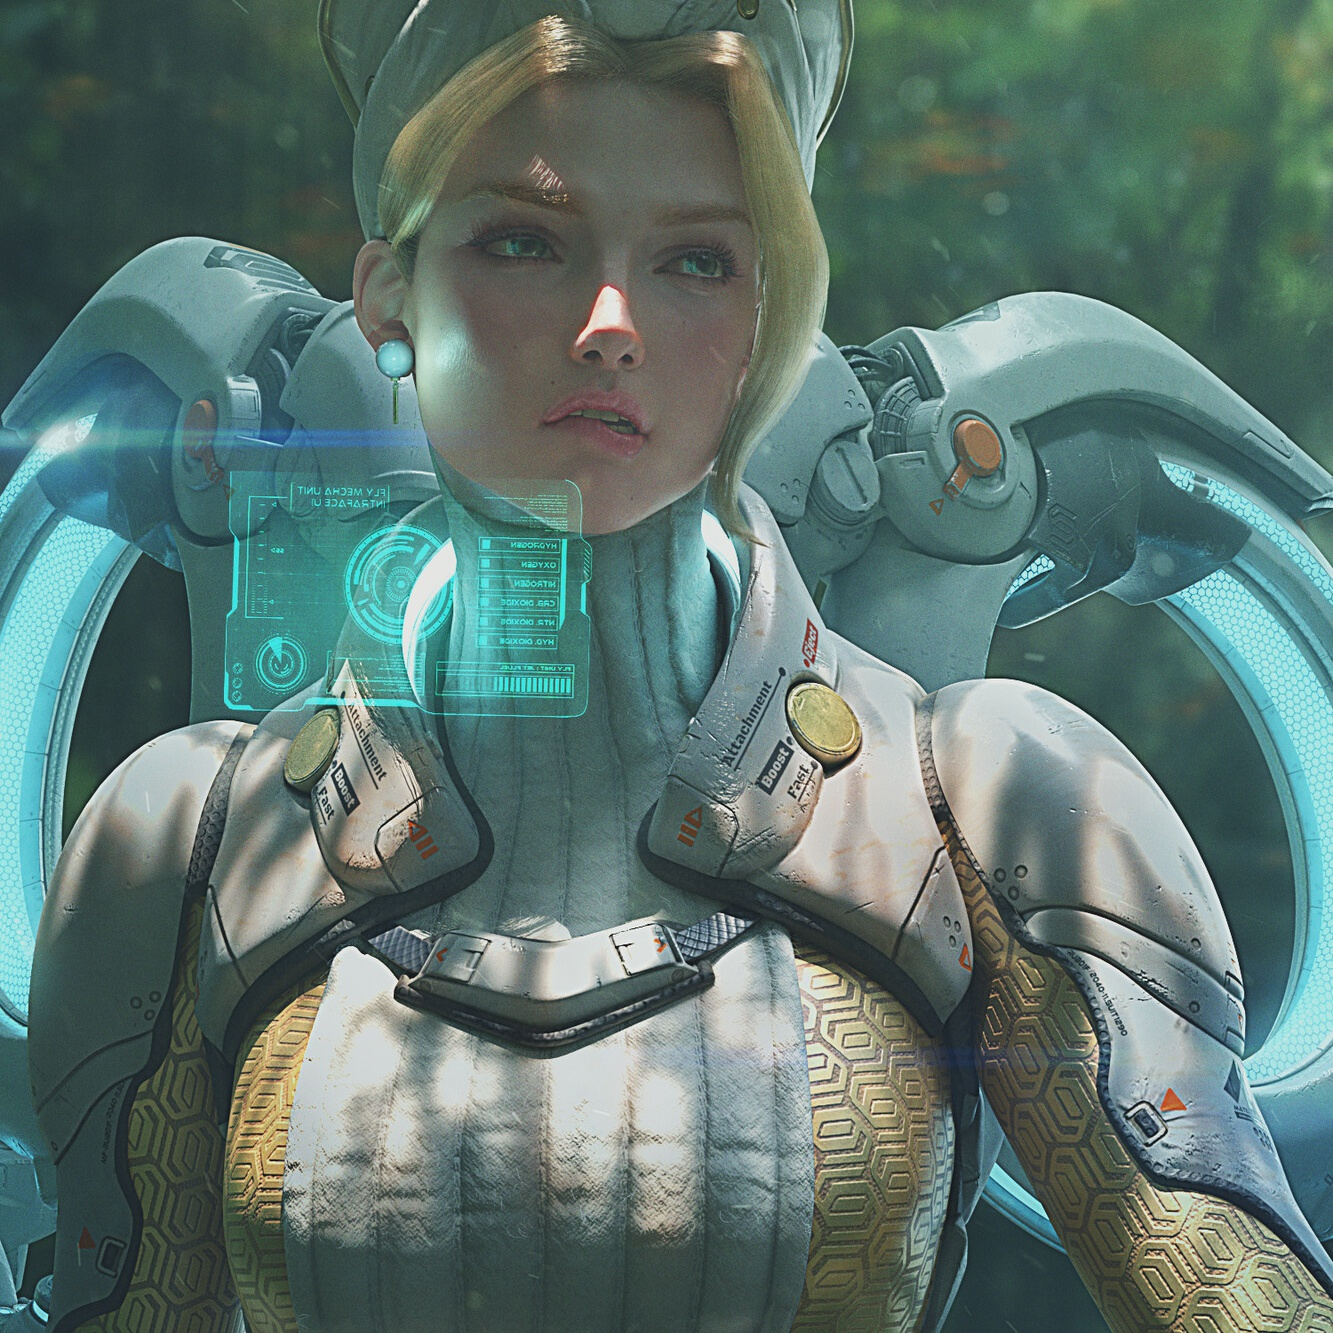 mercy overwatch inspired original character  model sculpt 3d